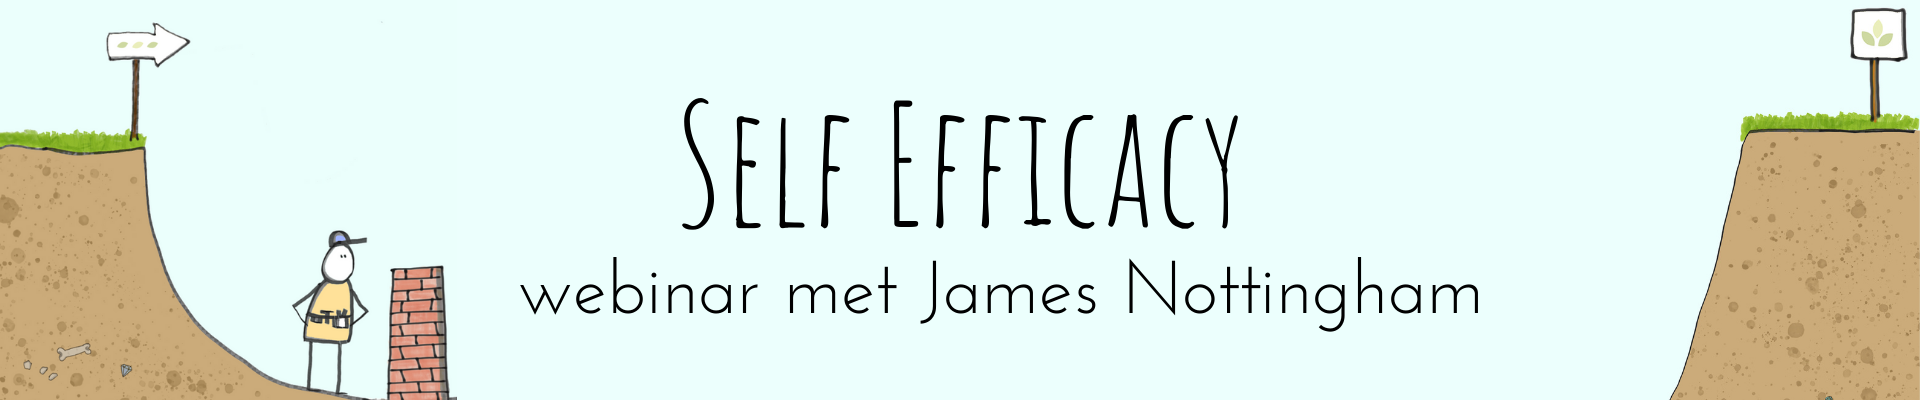 Webinar Self Efficacy - James Nottingham